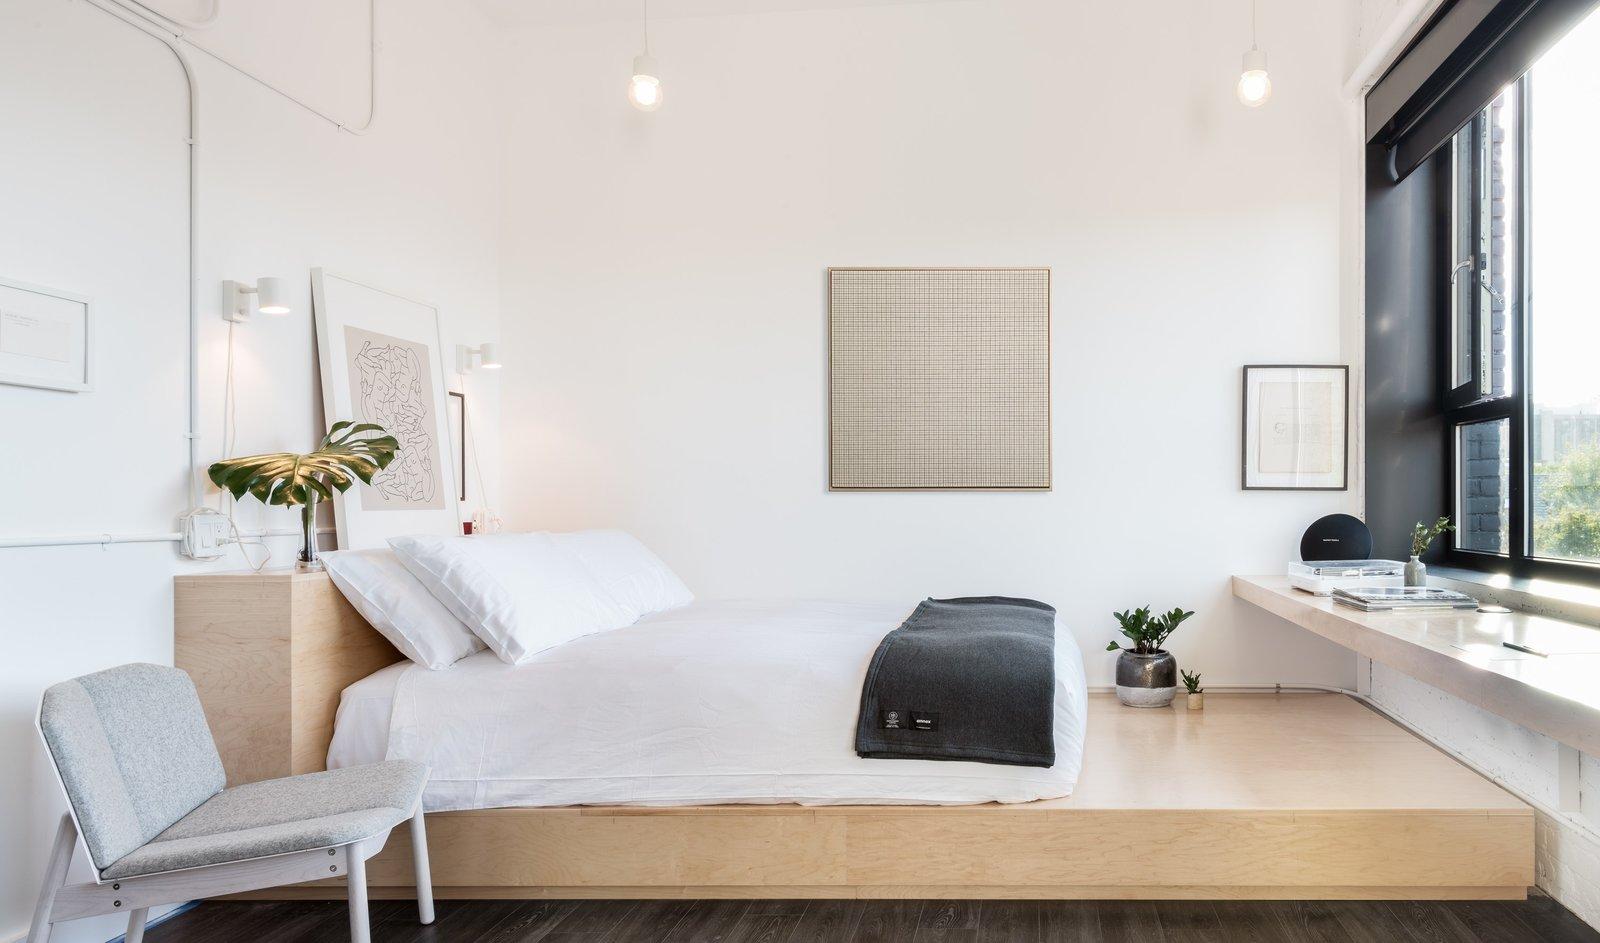 Pleasing Annex Hotel Modern Home In Toronto Ontario Canada On Dwell Download Free Architecture Designs Xerocsunscenecom